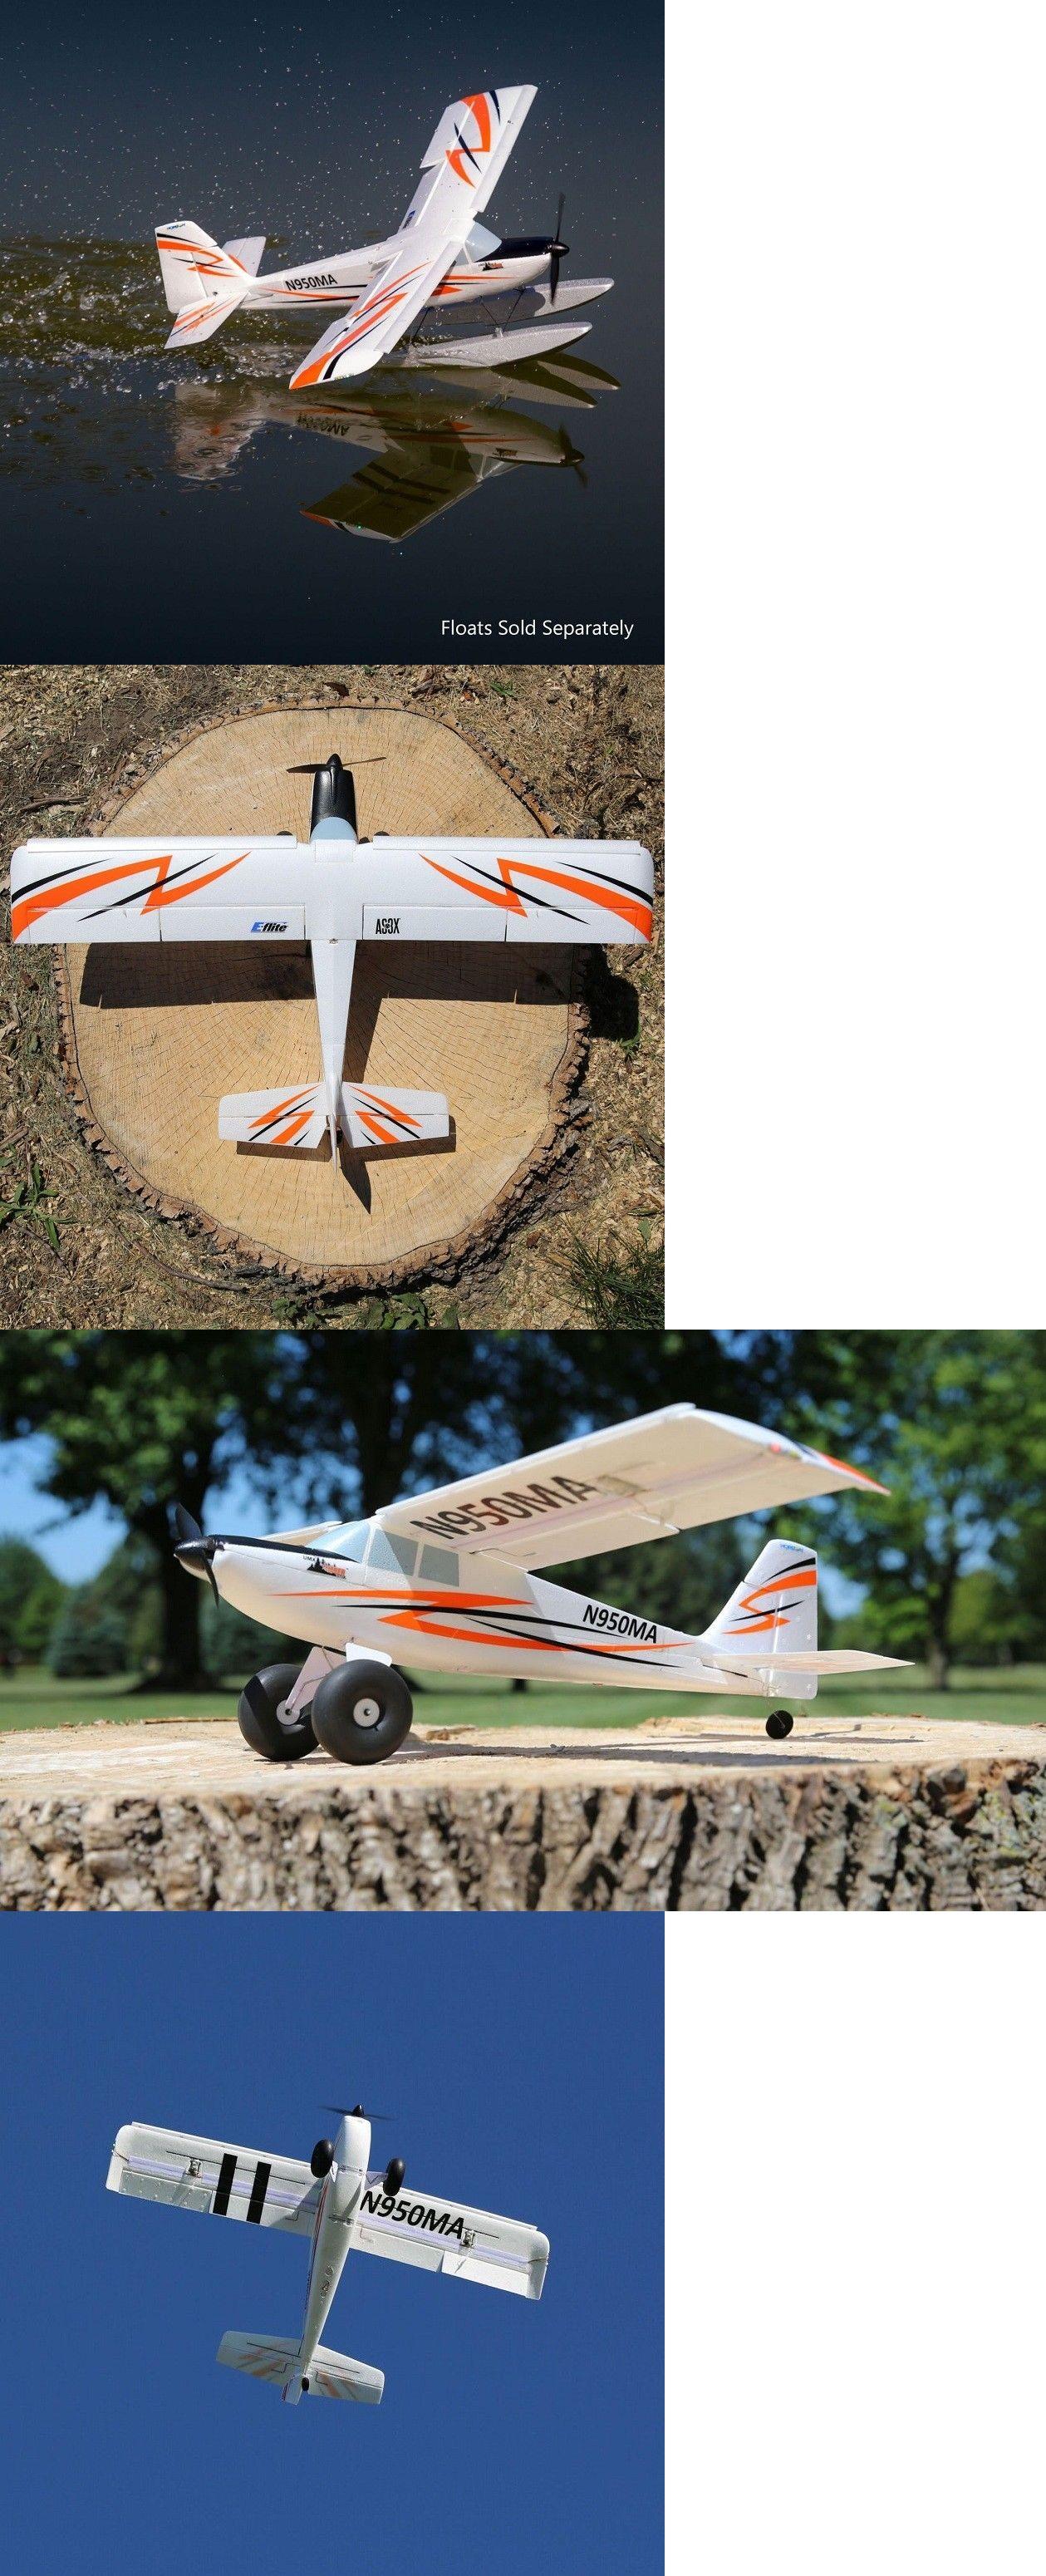 Airplanes 182182: E-Flite Umx Timber Bnf Basic Eflu3950